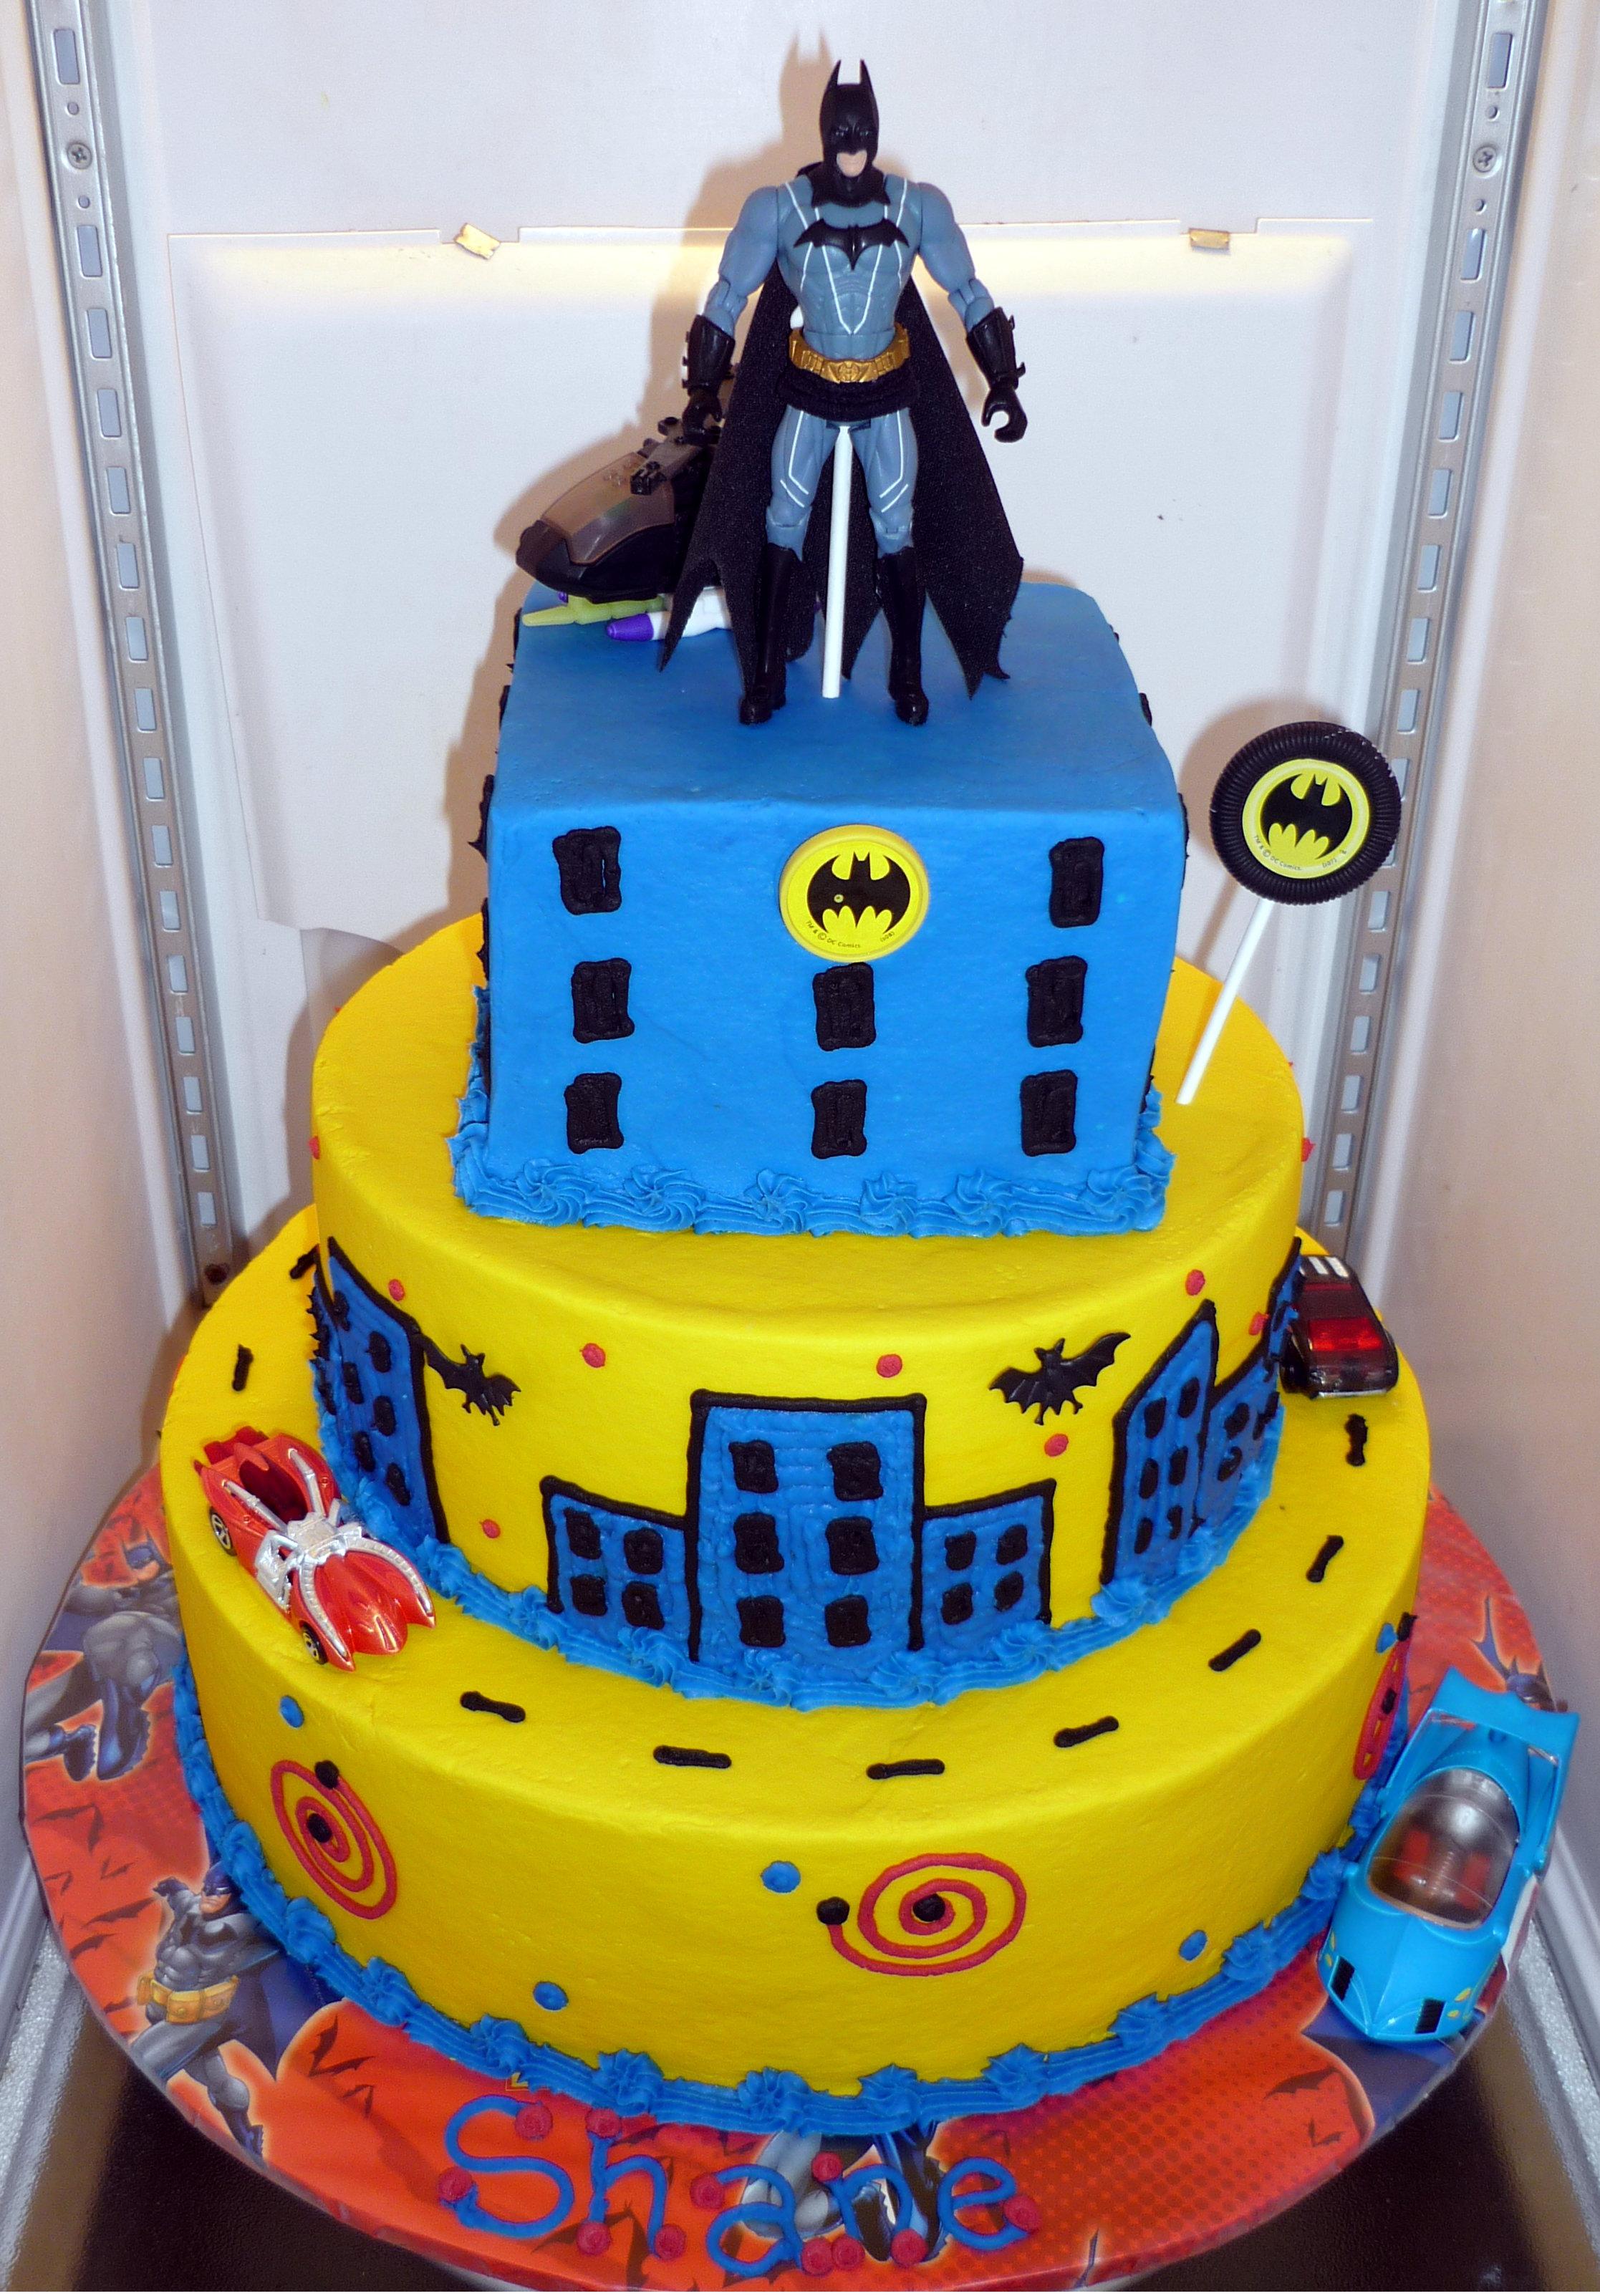 Tremendous Batman Cakes Decoration Ideas Little Birthday Cakes Personalised Birthday Cards Cominlily Jamesorg